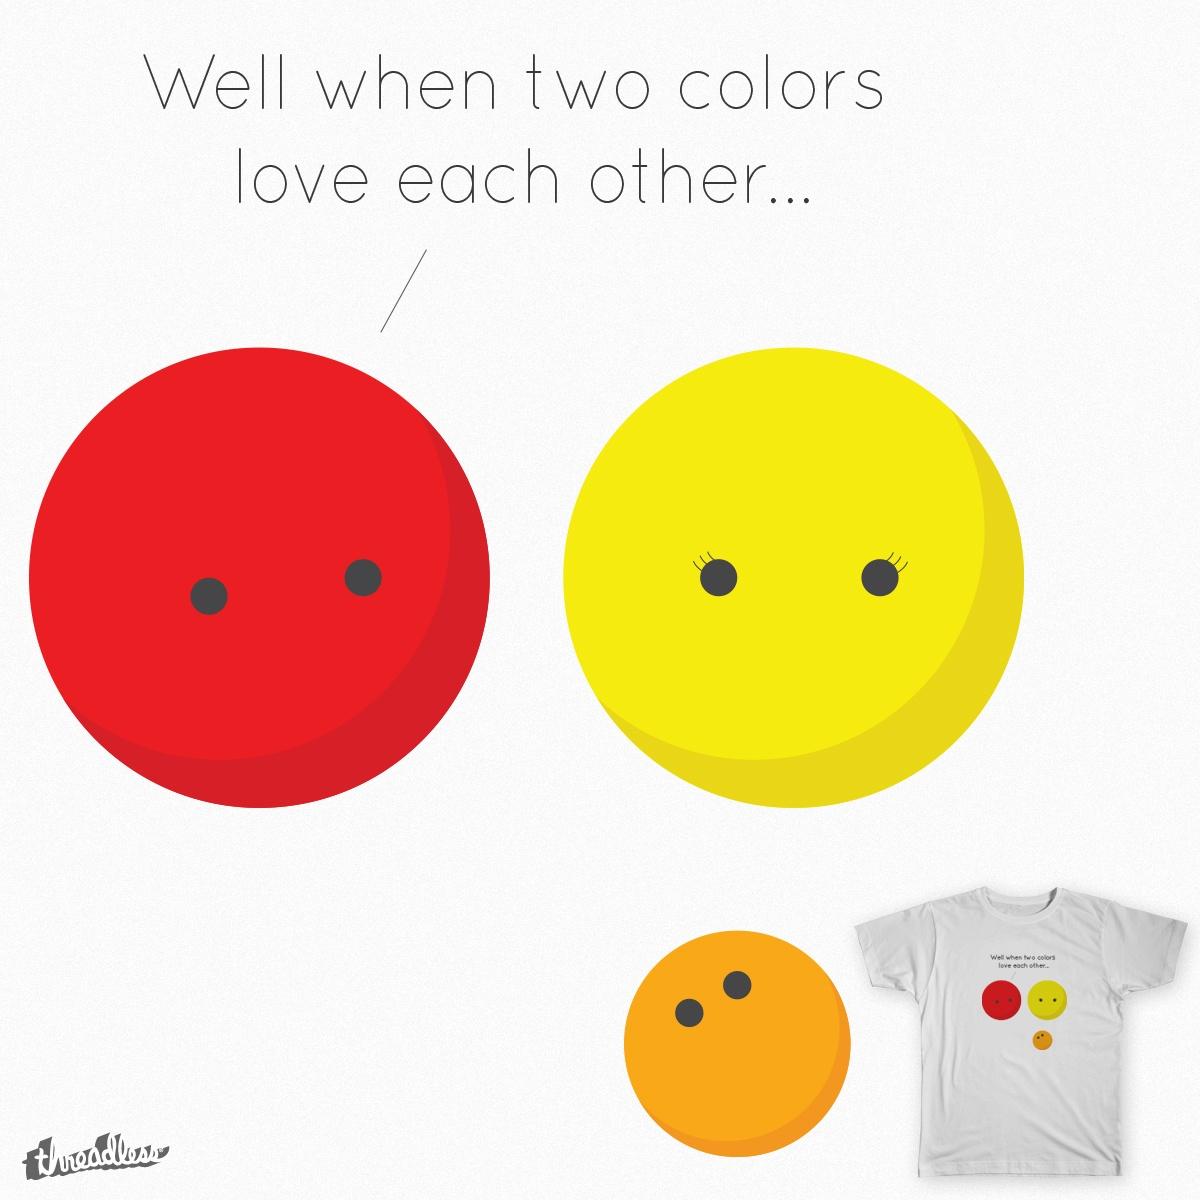 Color Talk by cjiro on Threadless